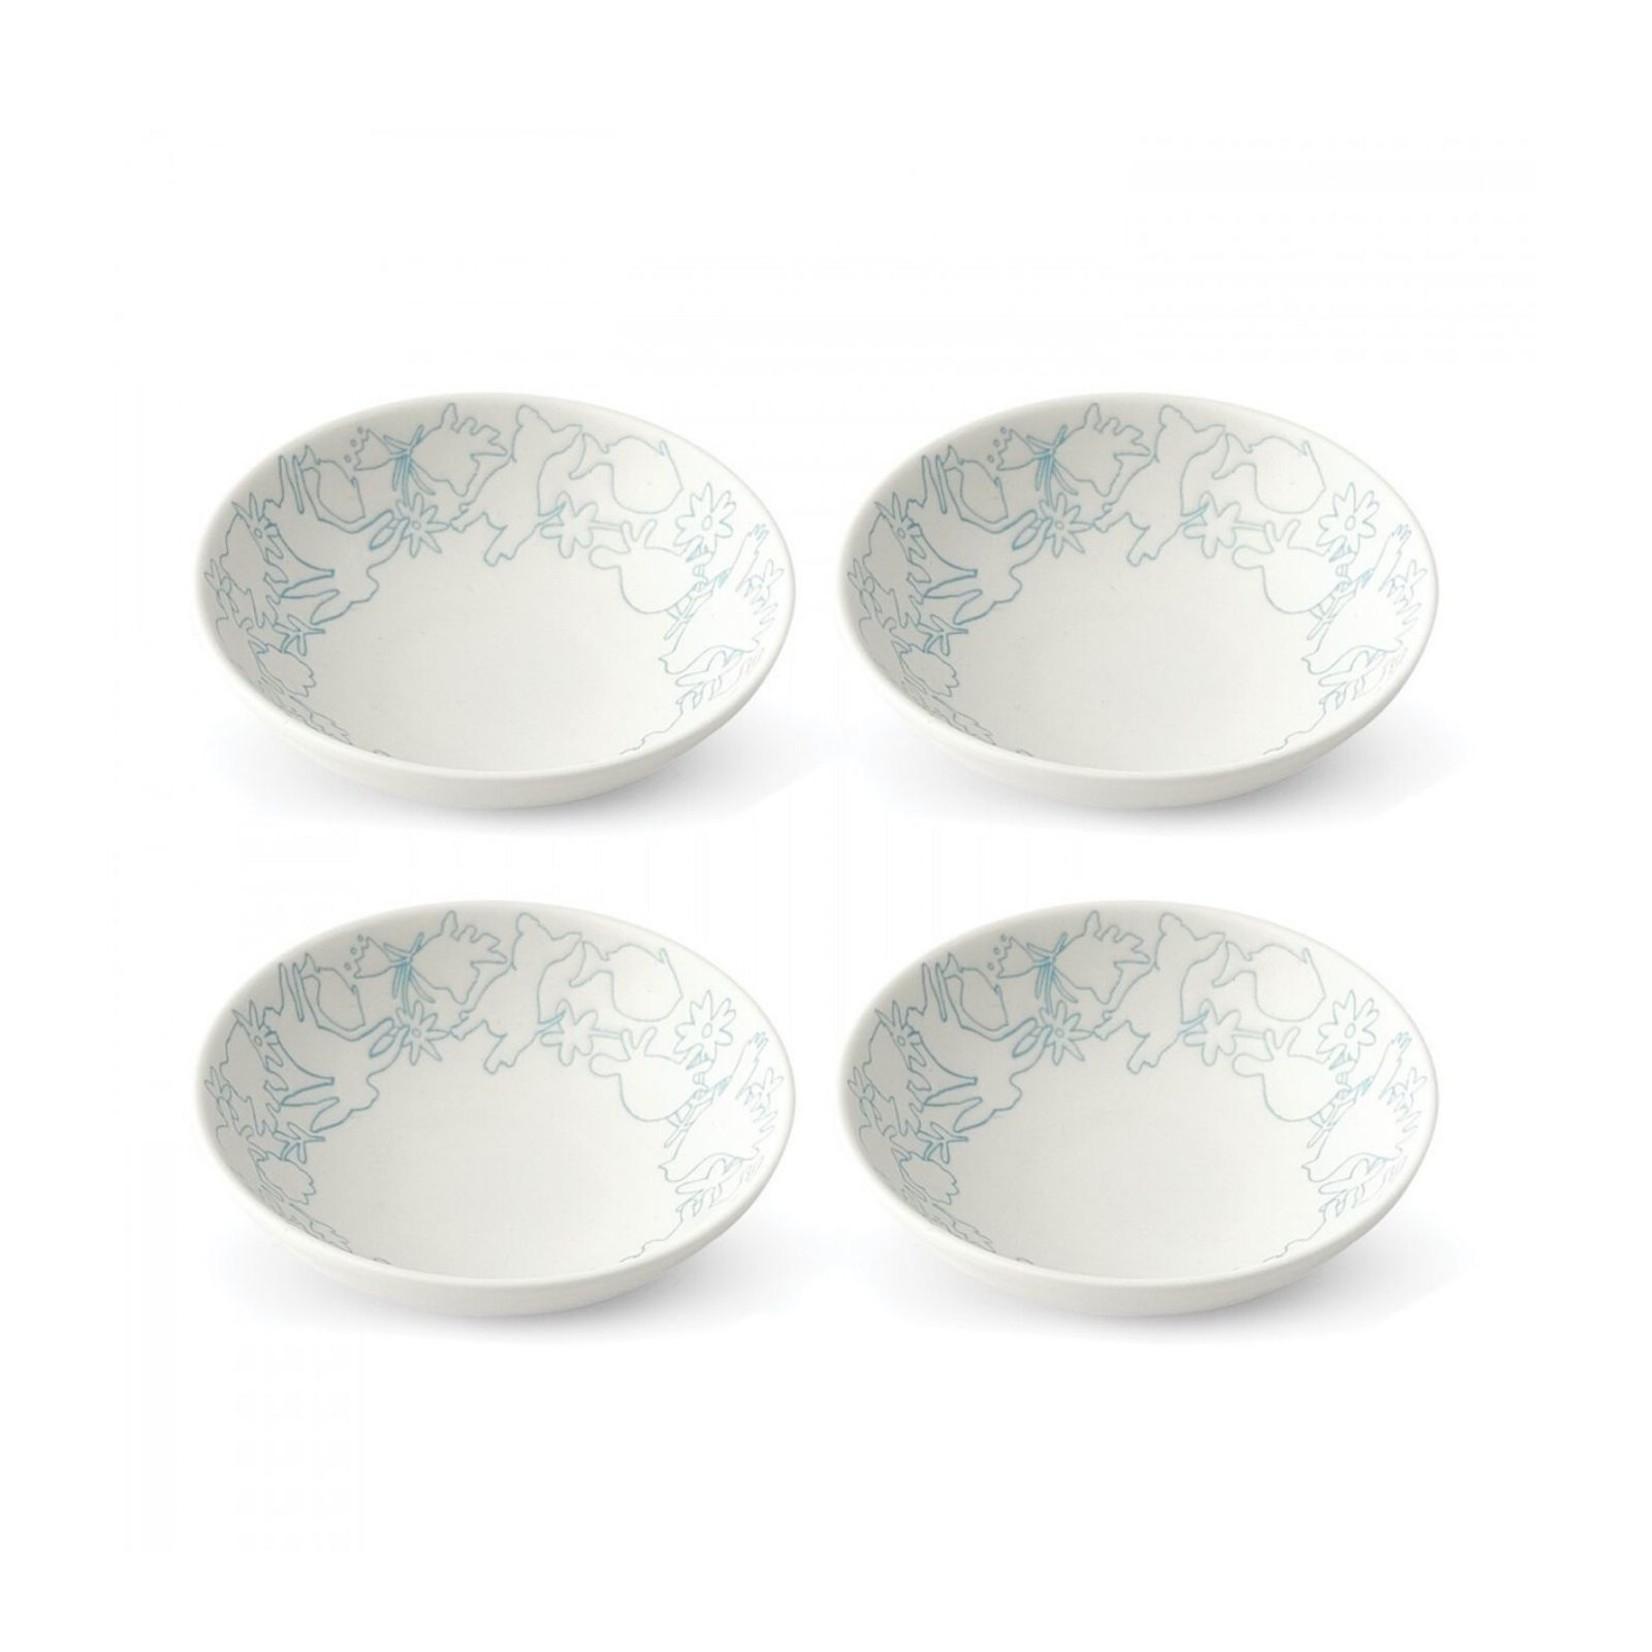 Polar Blue Accents Bowls Set of 4